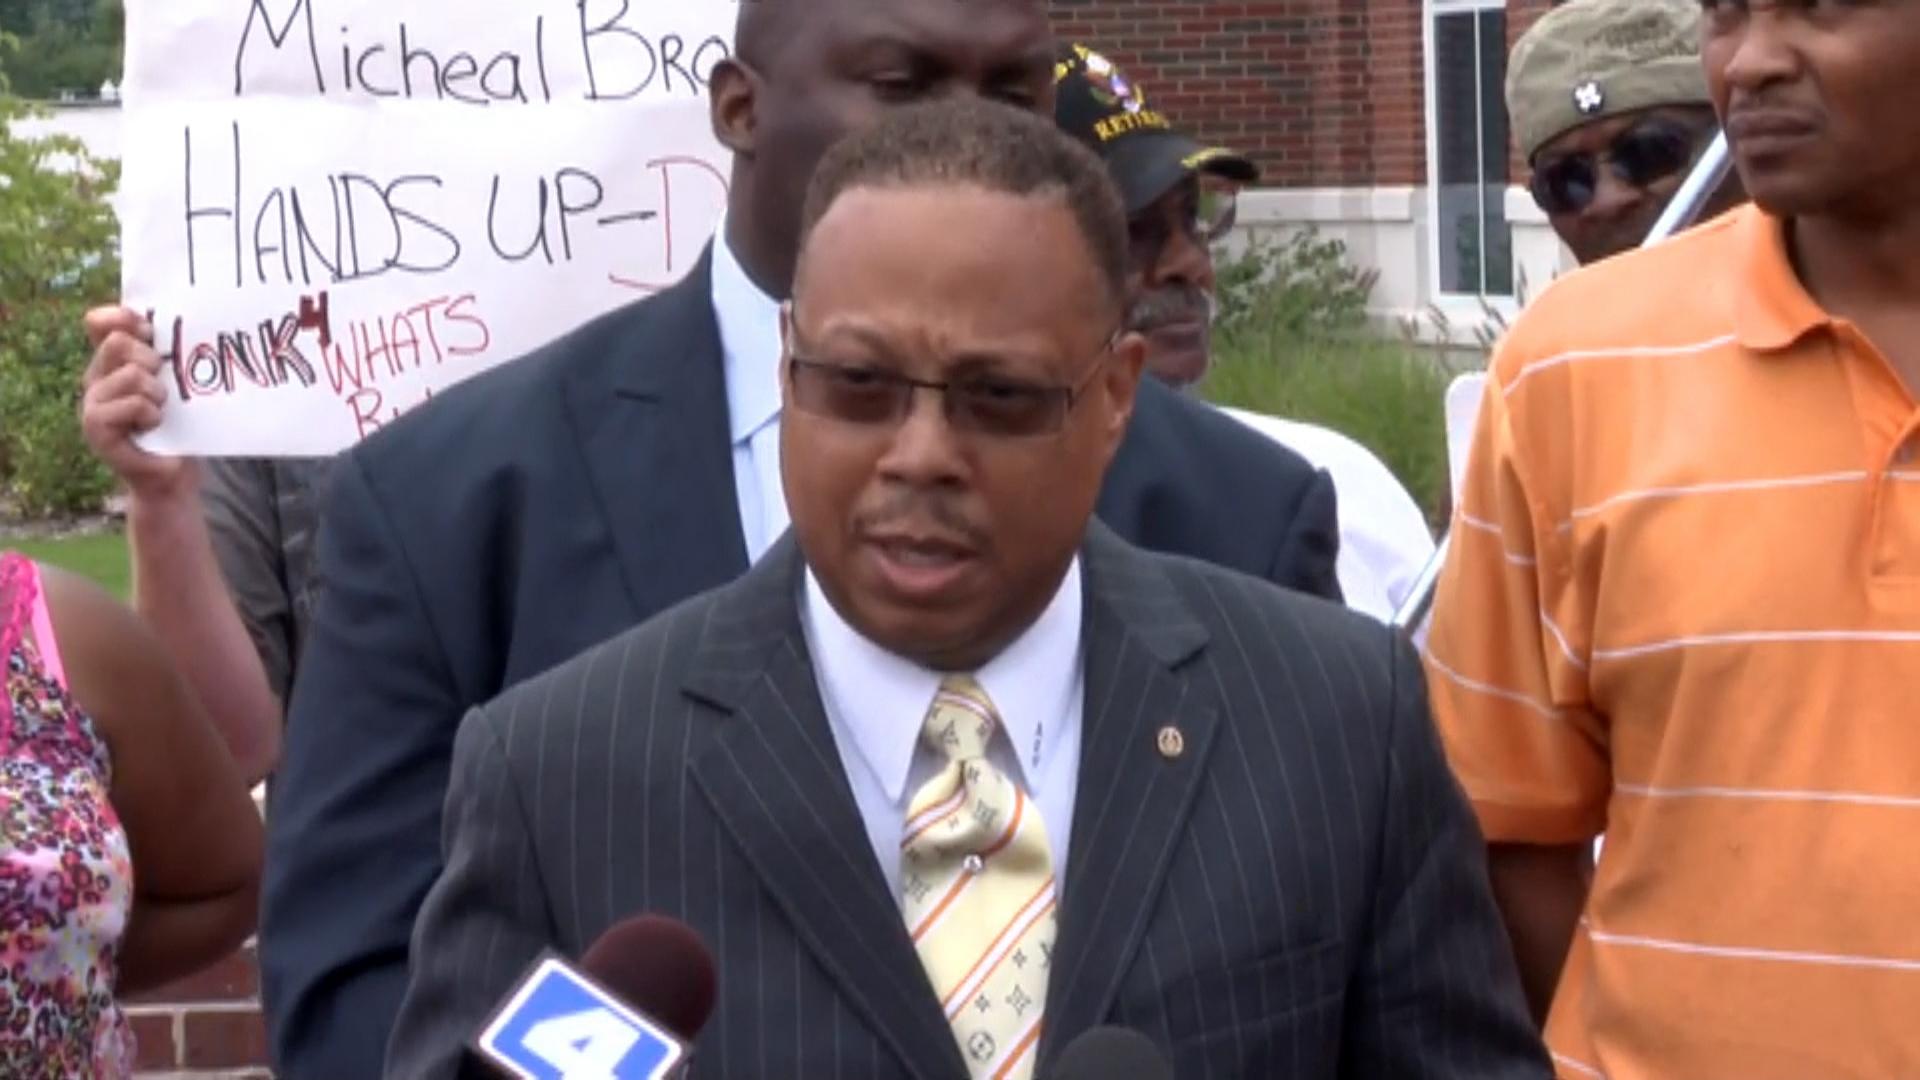 Michael Brown Killing: Police in Ferguson Fire Tear Gas Amid Looting